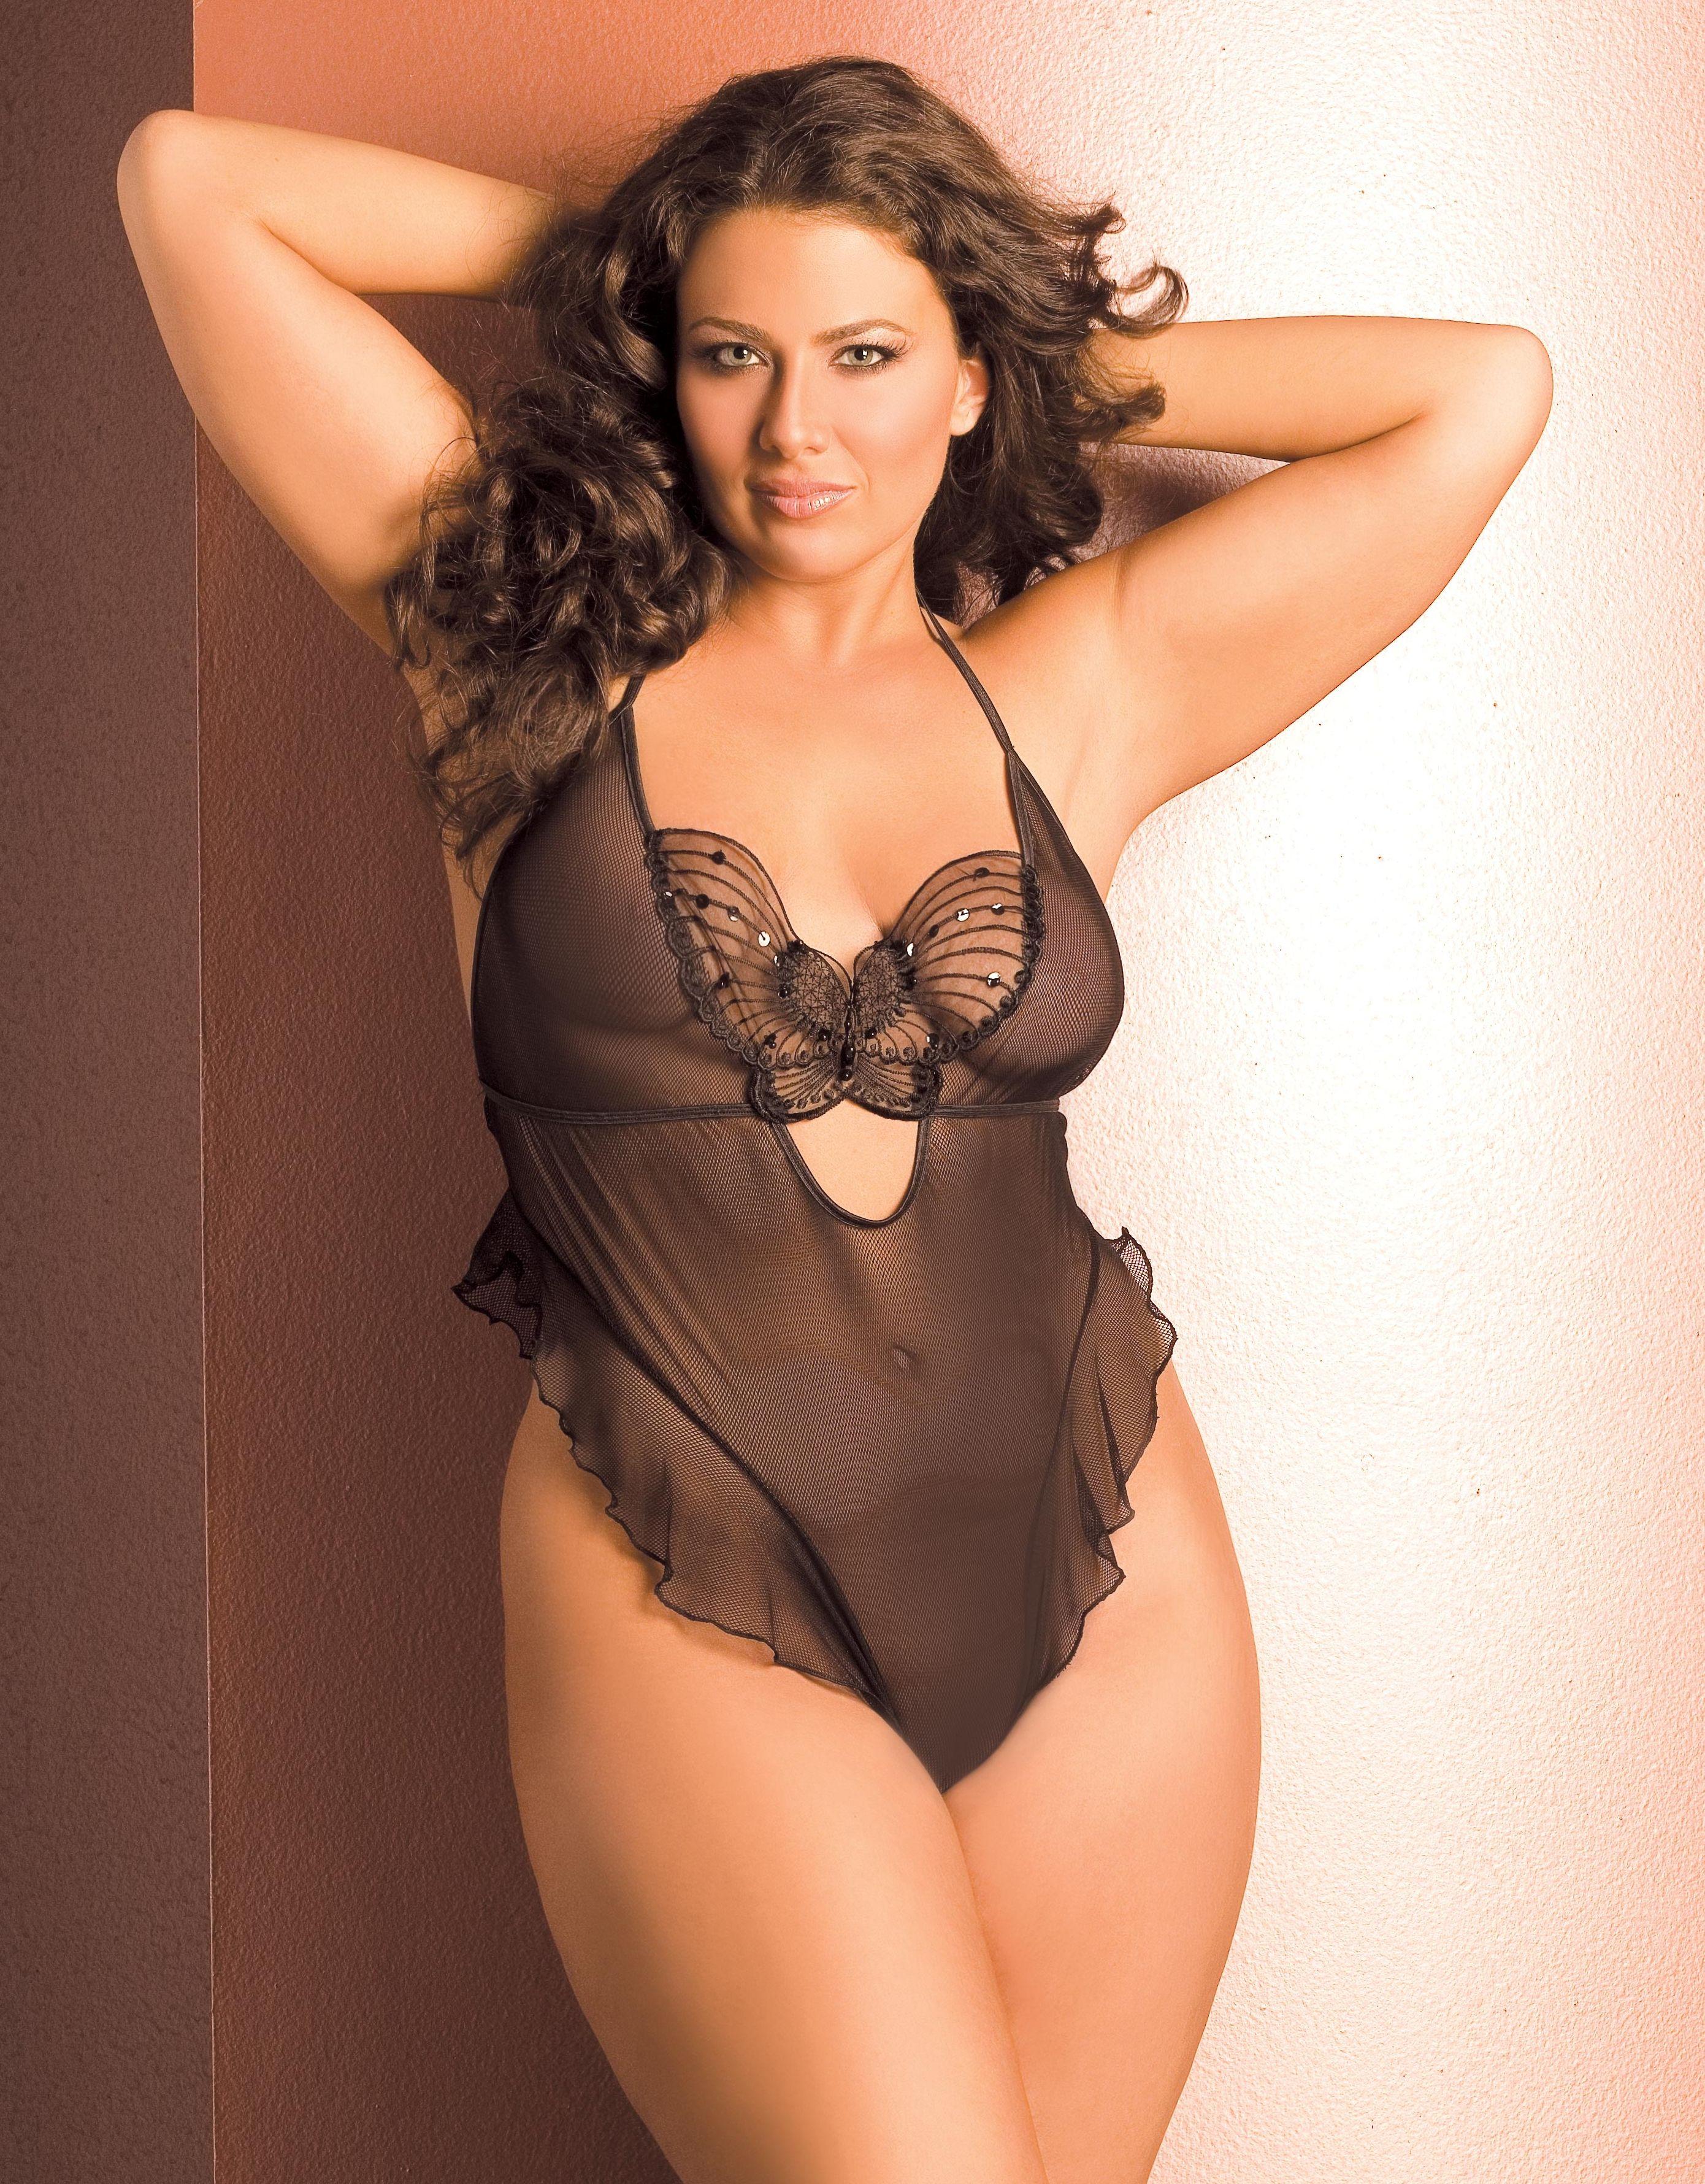 Plus size model Lydia Fixel - Vacari lingerie | Plus Size Models ...